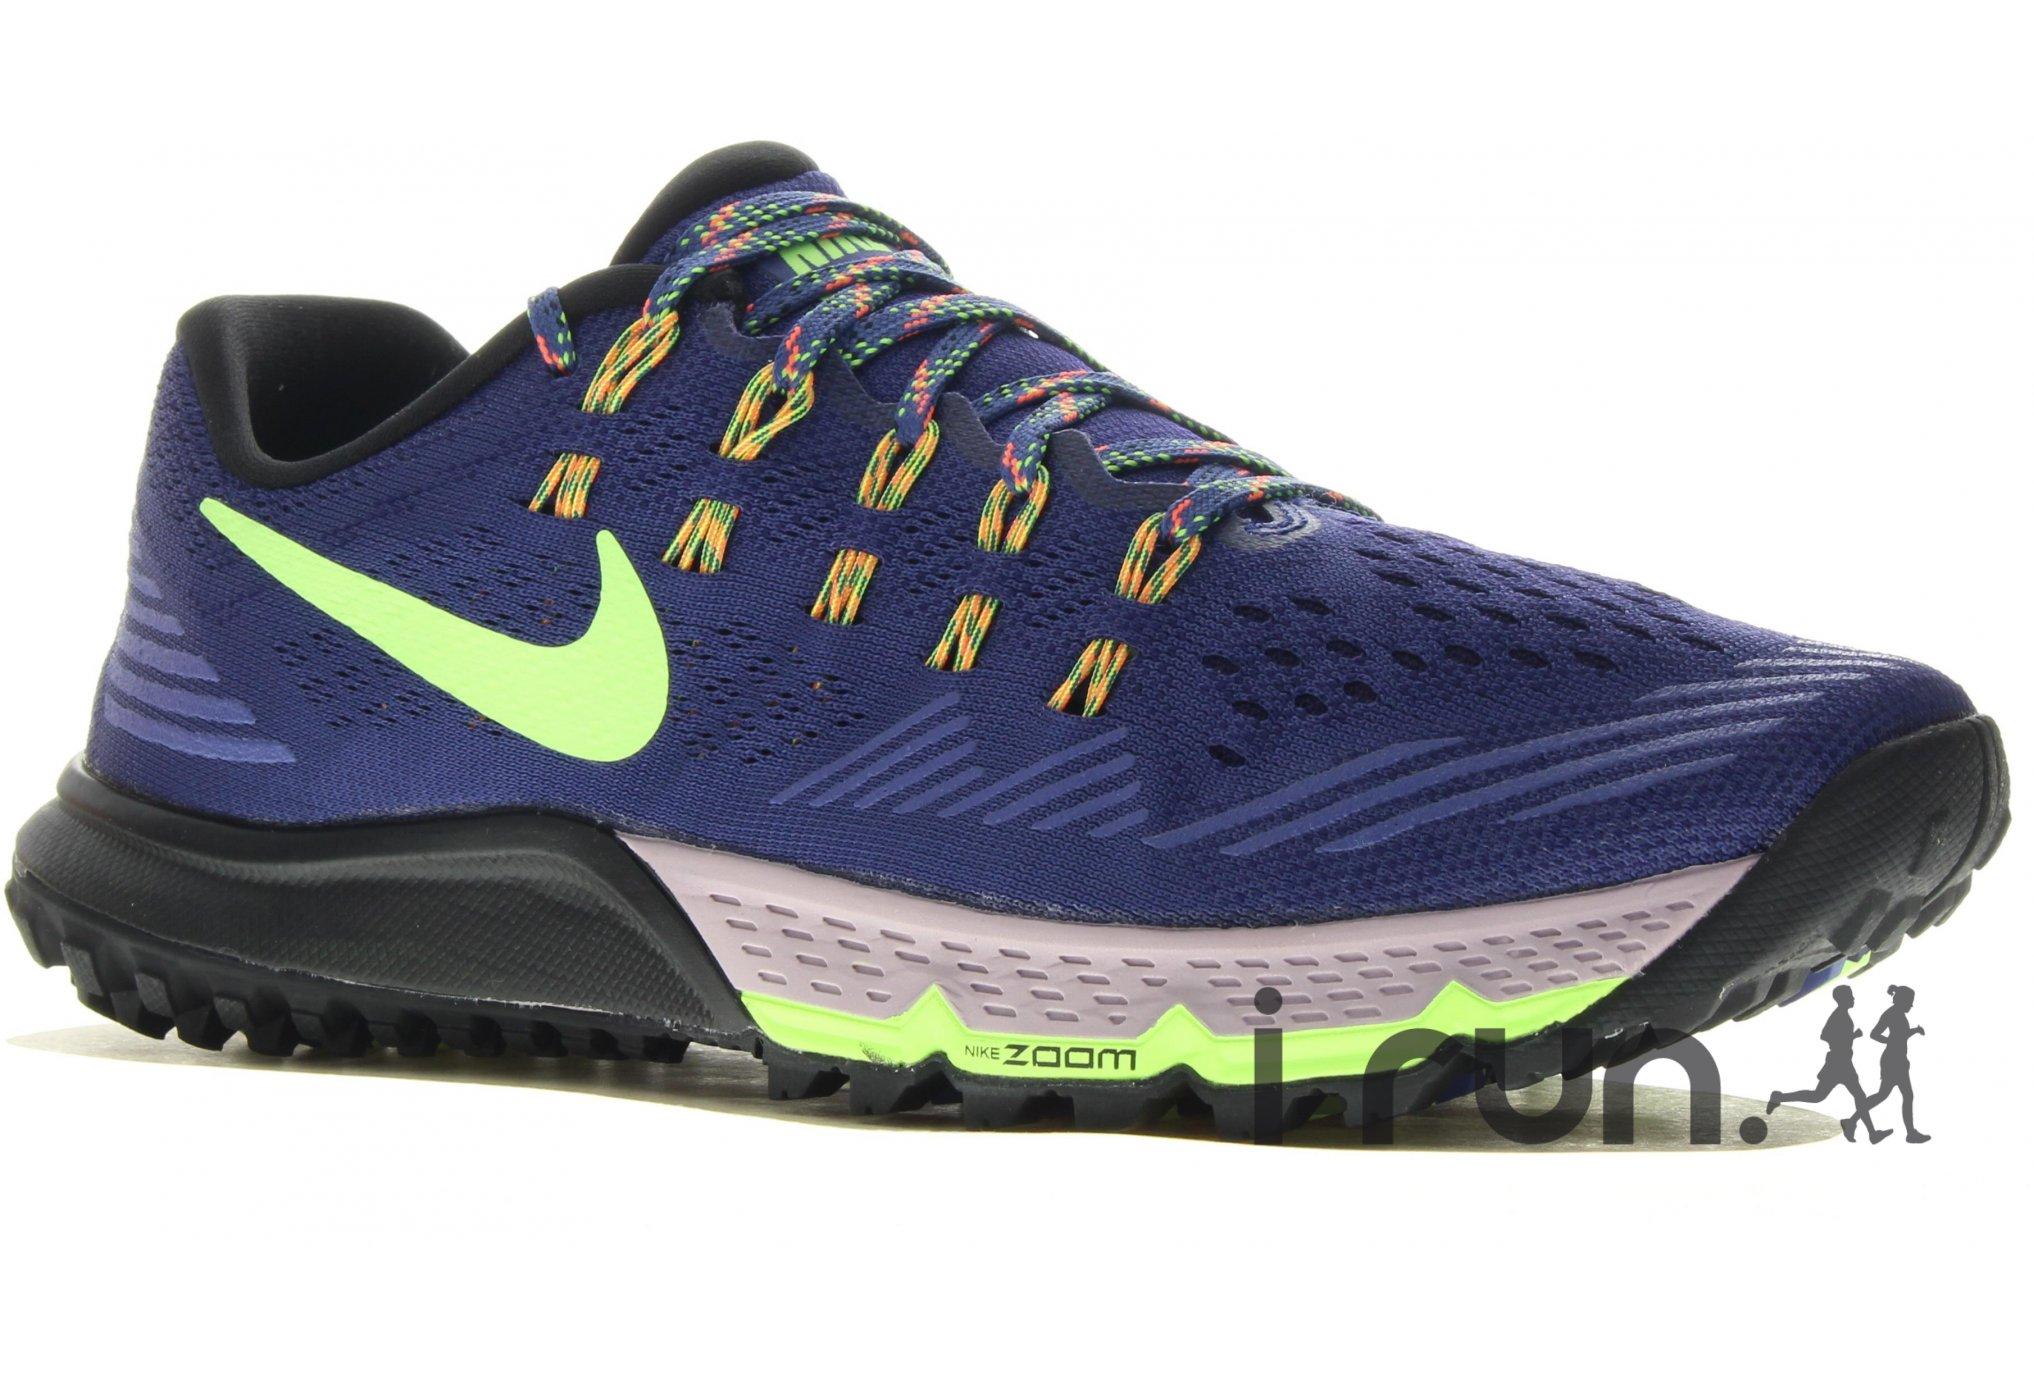 sneakers for cheap bb8cd 2ec23 Nike Zoom Terra Kiger 3 W Chaussures running femme nike terra kiger femme